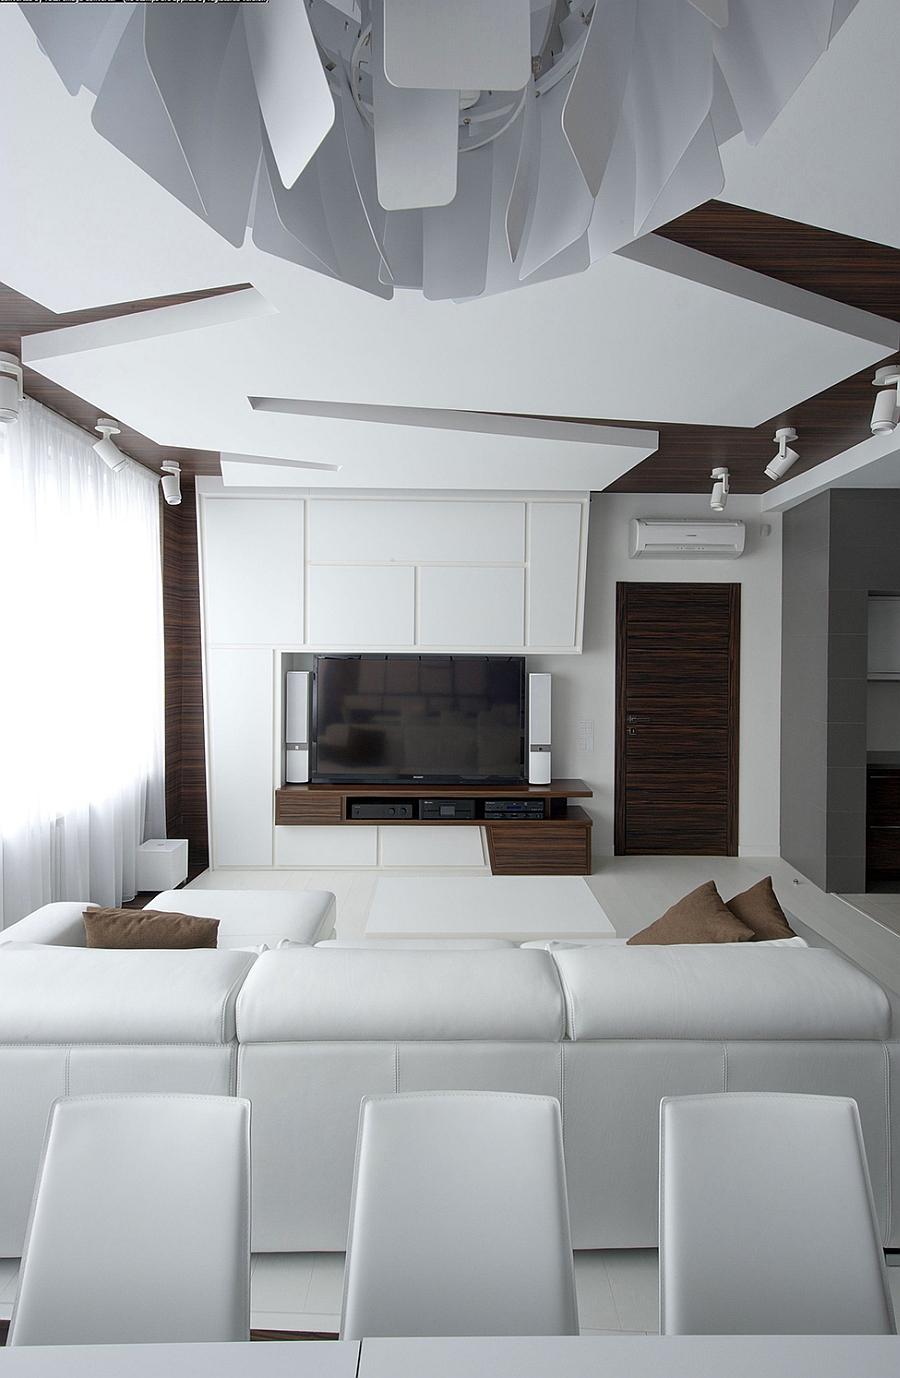 Stunning minimalist apartment by Vladimir Malashonok